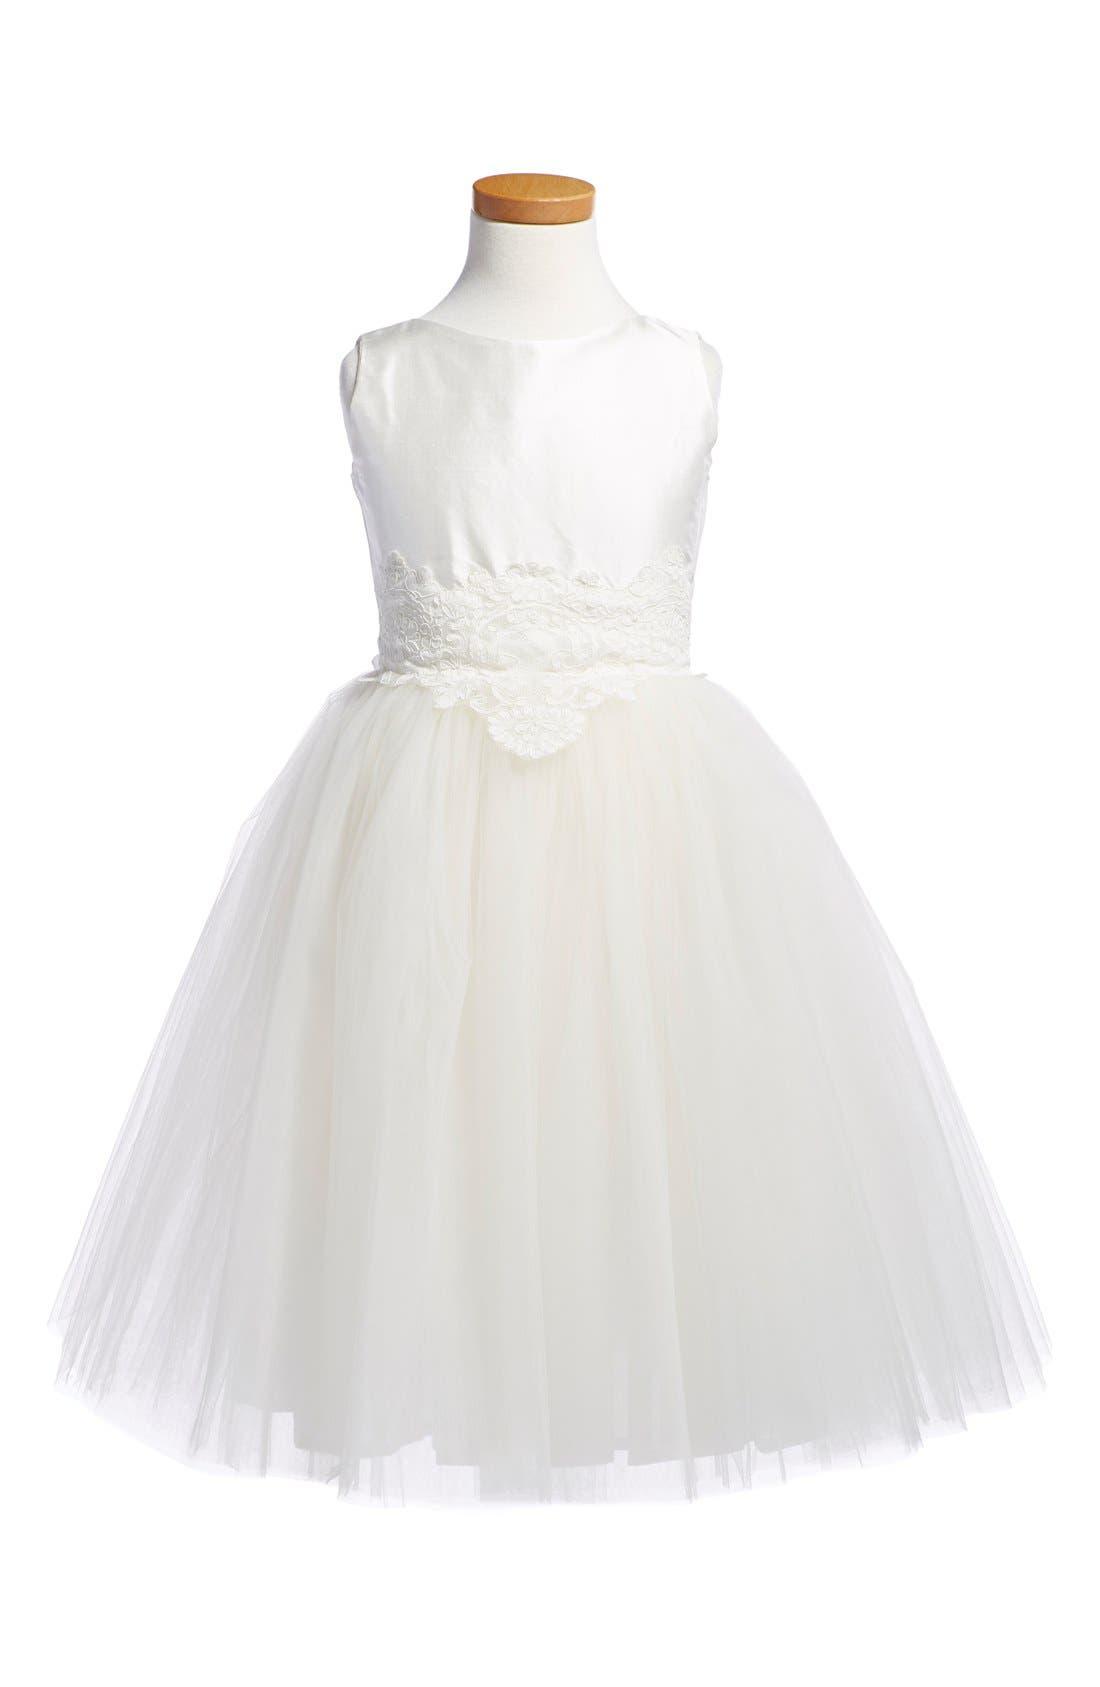 'Enchanting' Sleeveless Taffeta Dress,                             Main thumbnail 1, color,                             900